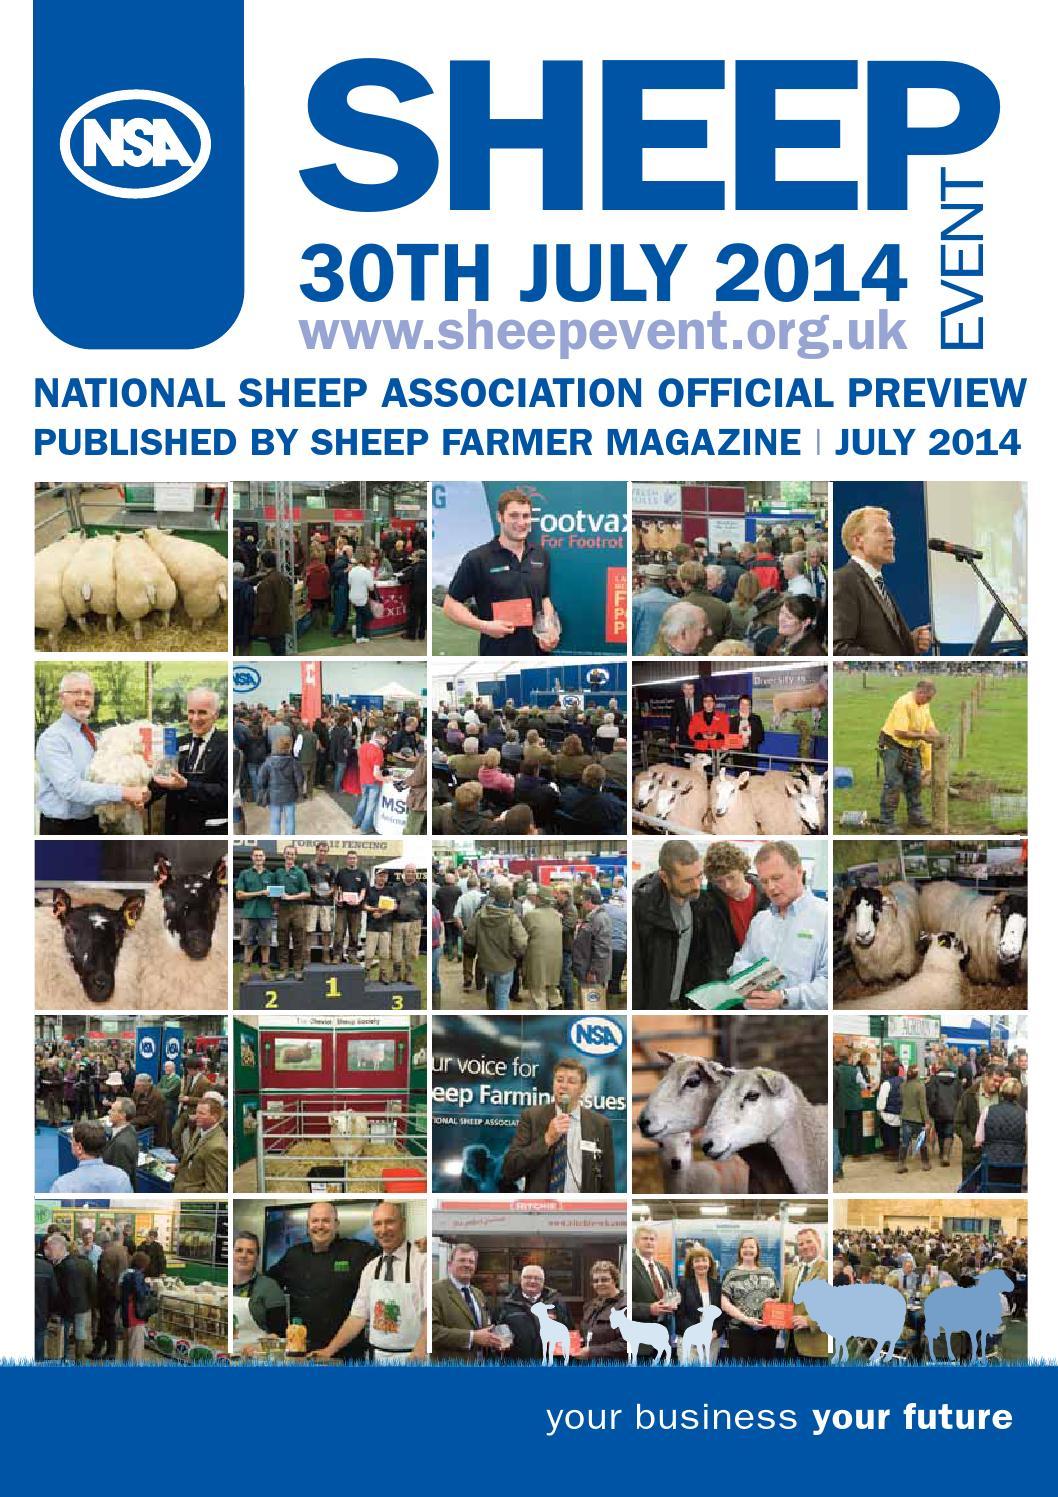 Sheep farmer july august 2014 by Joanne Briggs - issuu